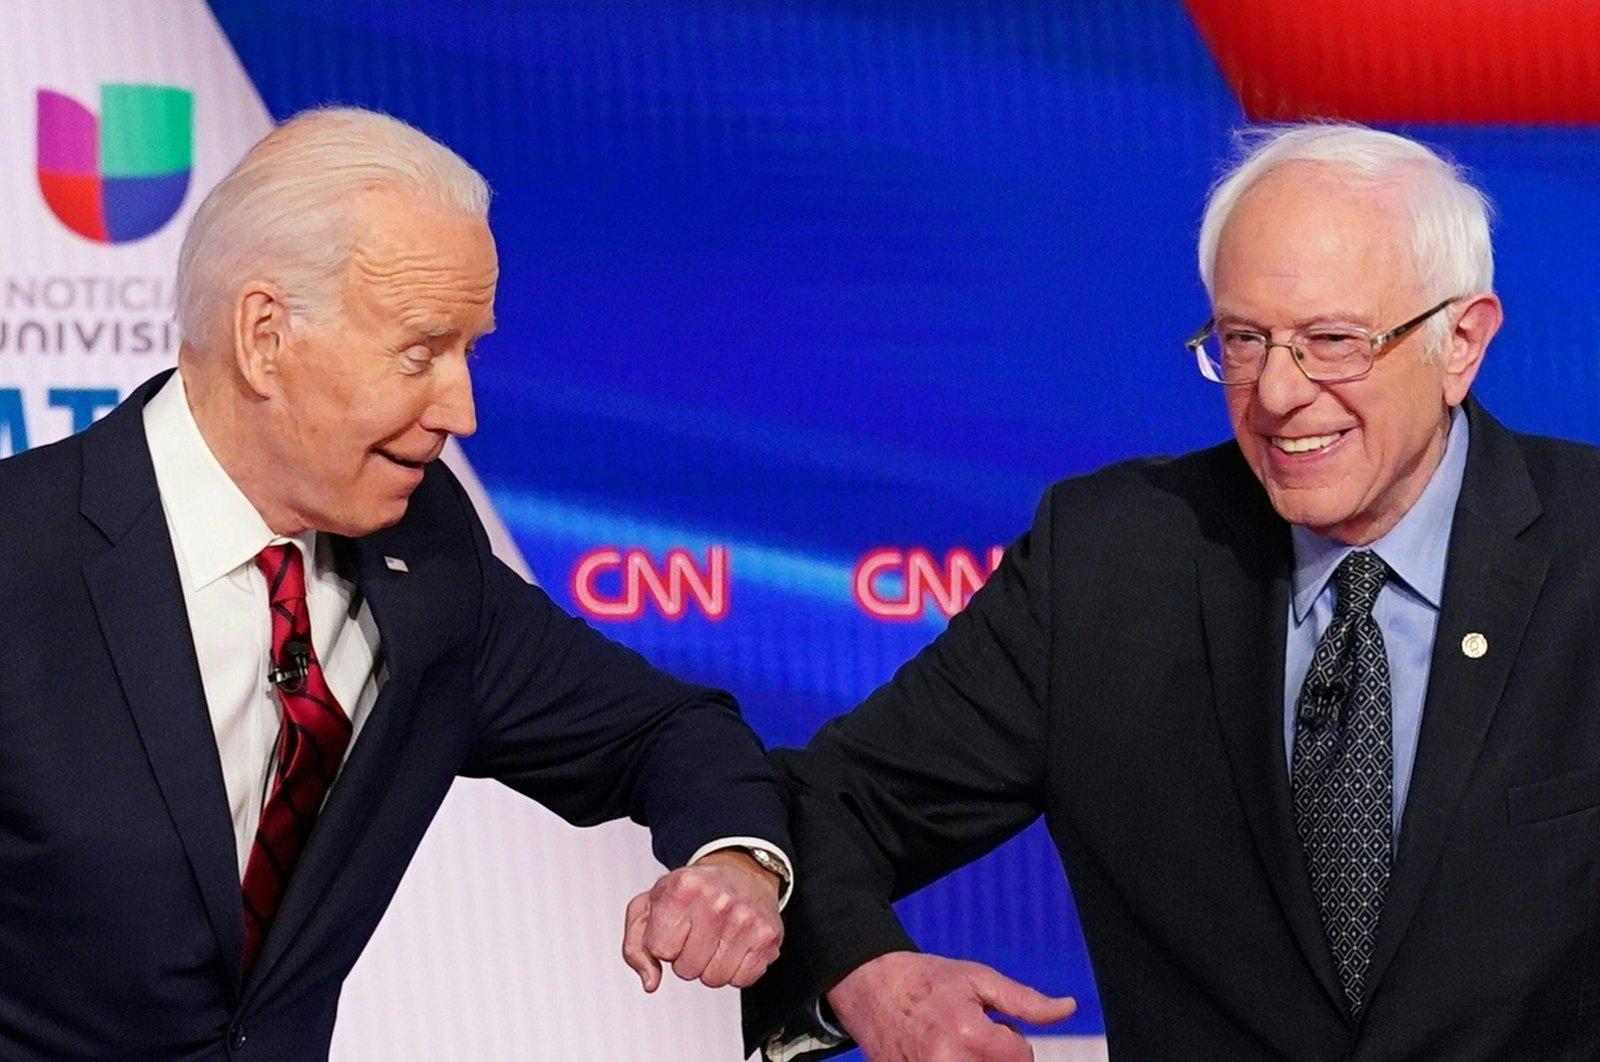 Joe Biden (L) and Senator Bernie Sanders greet each other with a safe elbow bump before the start of the 11th Democratic Party 2020 presidential debate in a CNN Washington Bureau studio in Washington, March 15, 2020. (AFP Photo)